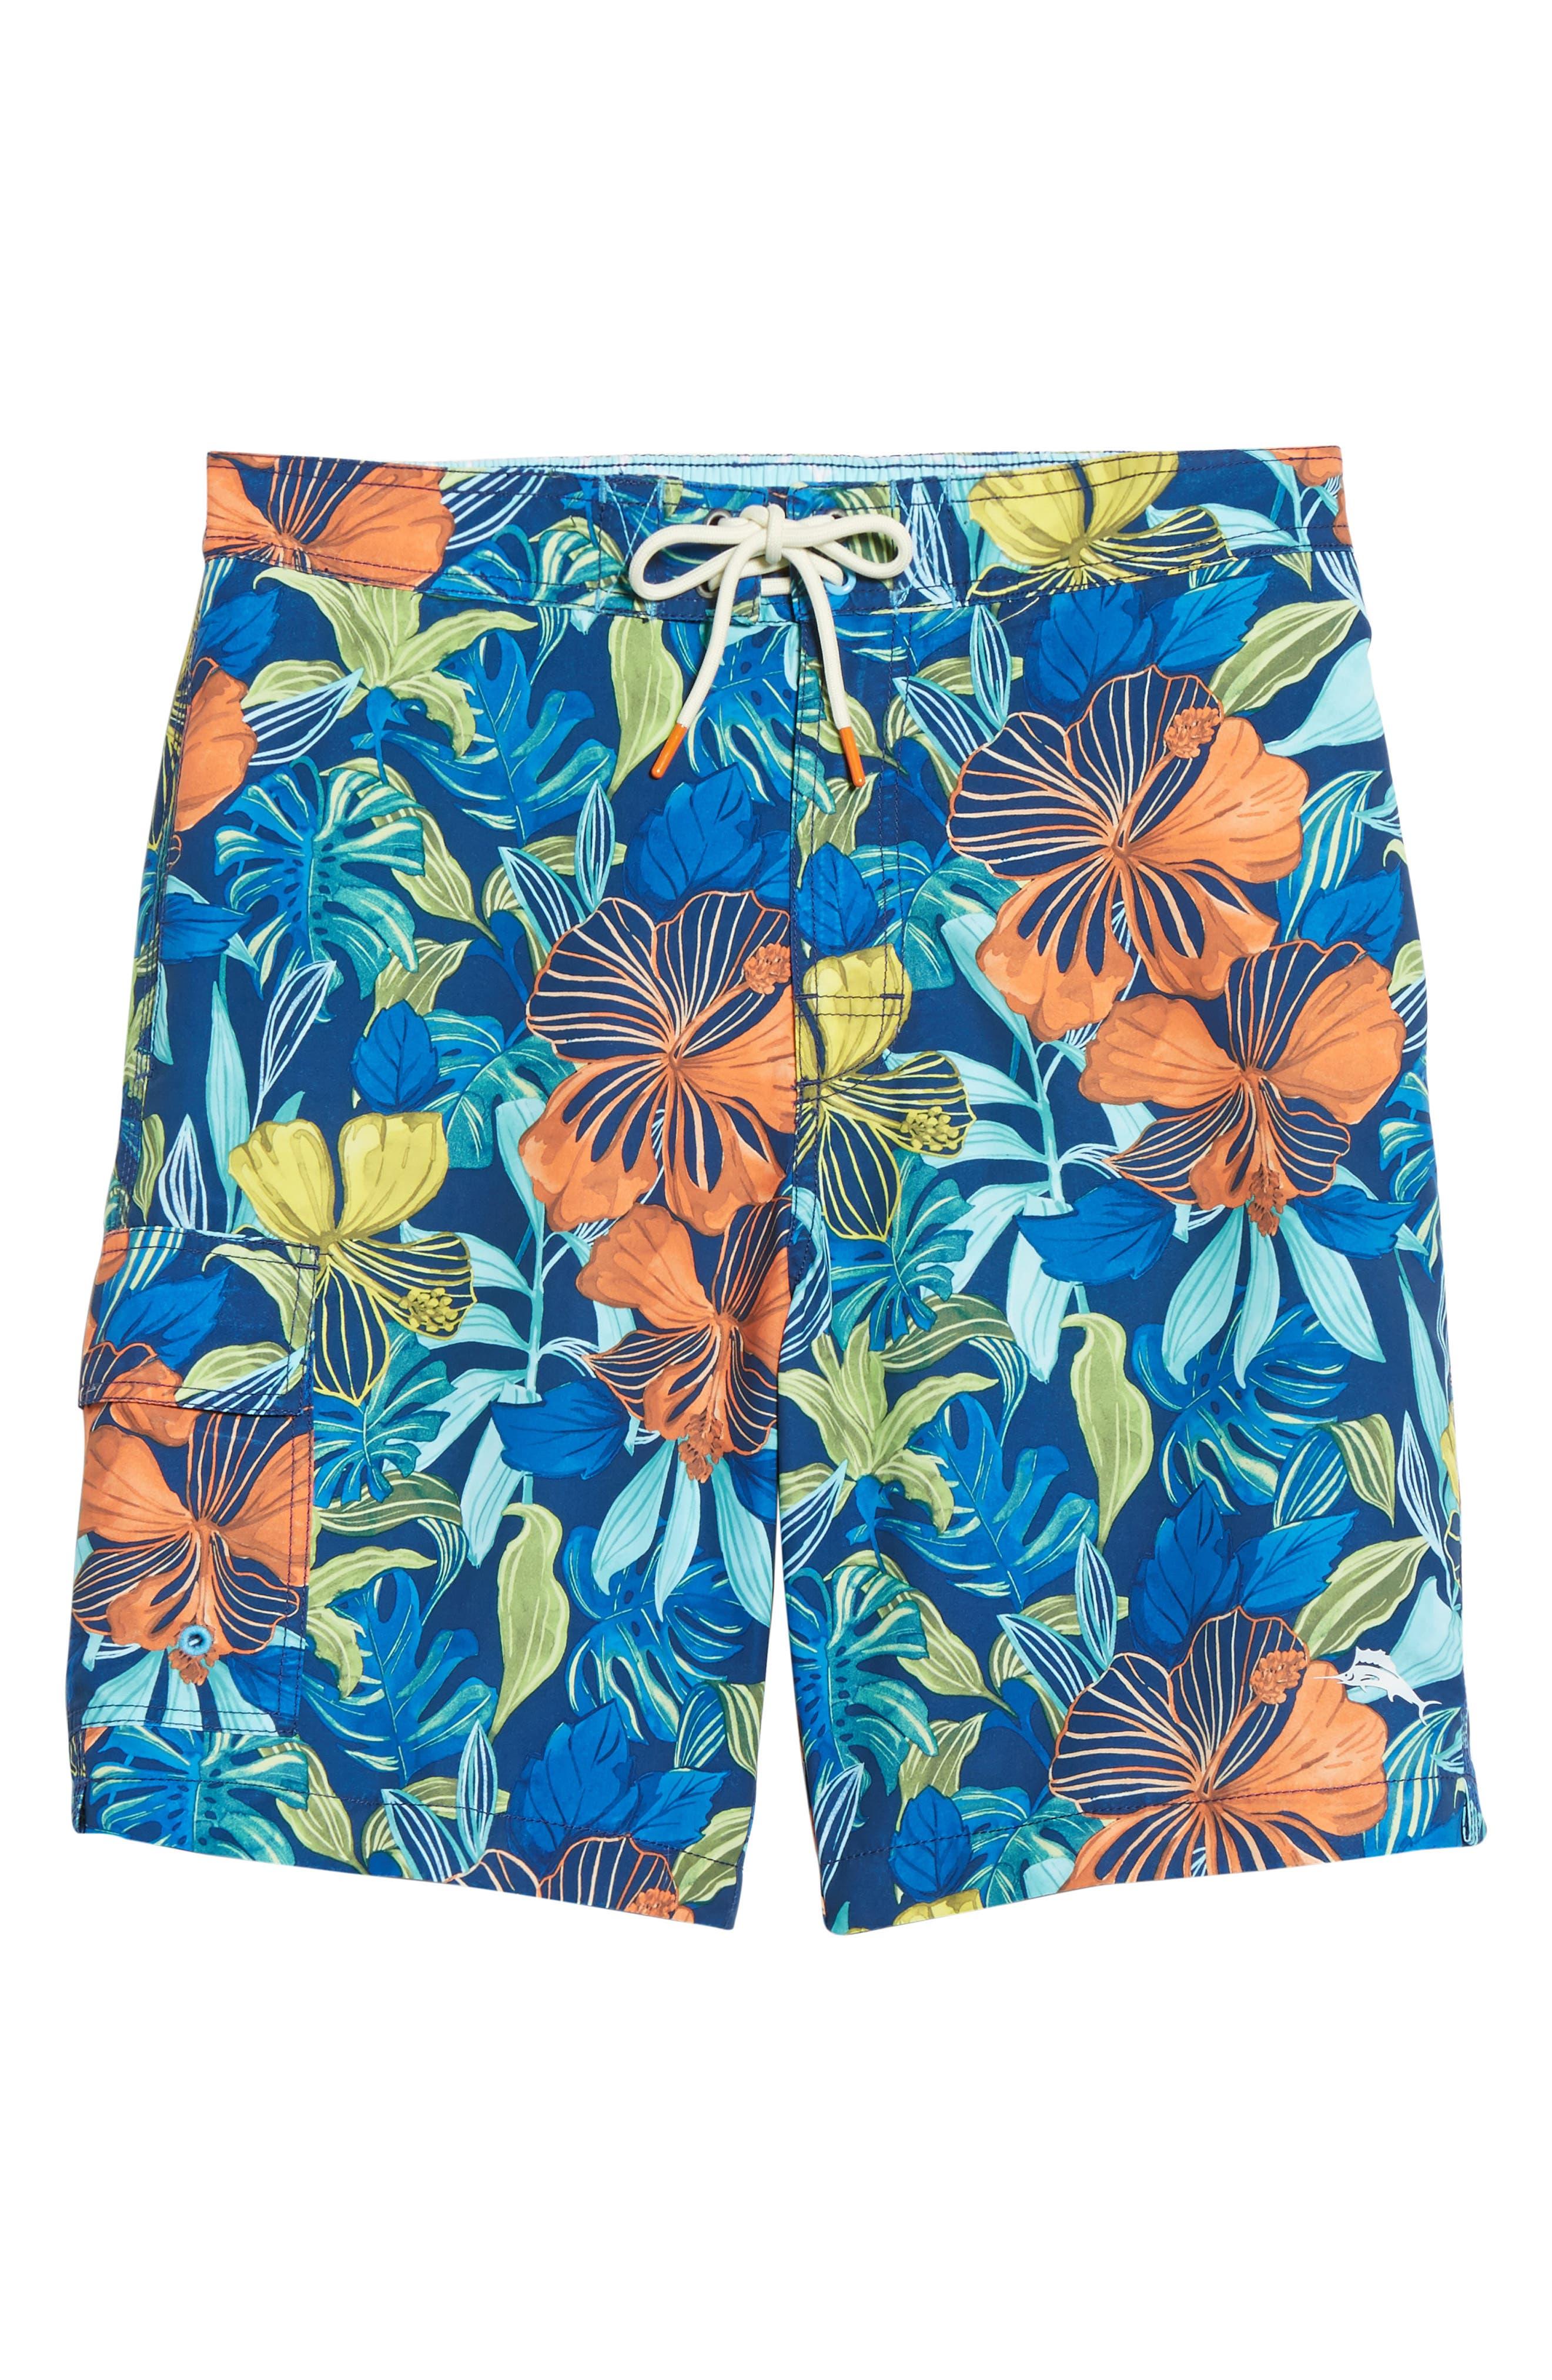 Baja Hibiscus Beach Swim Trunks,                             Alternate thumbnail 6, color,                             Kingdom Blue